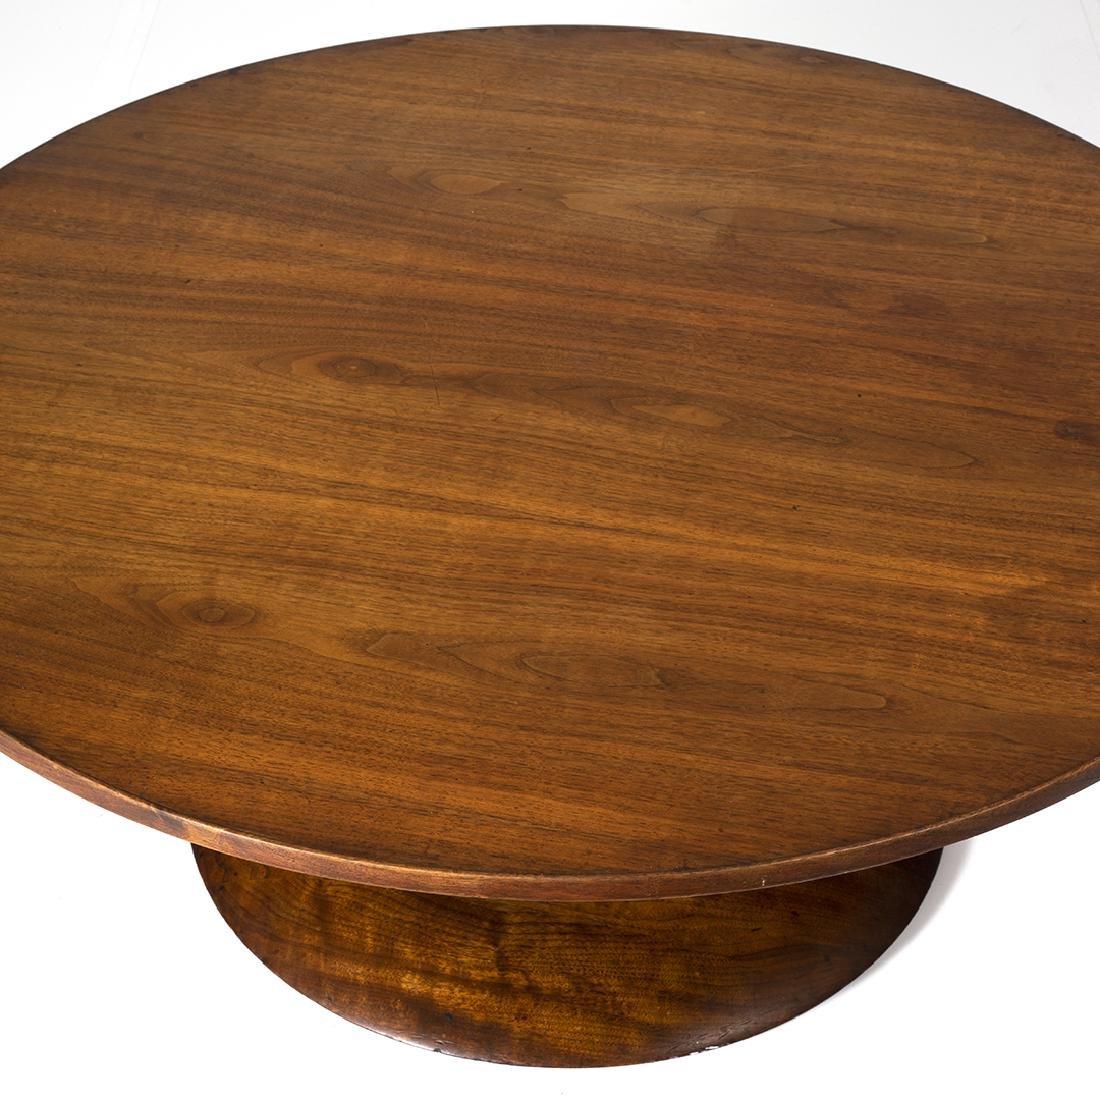 Modernist Coffee Table - 2